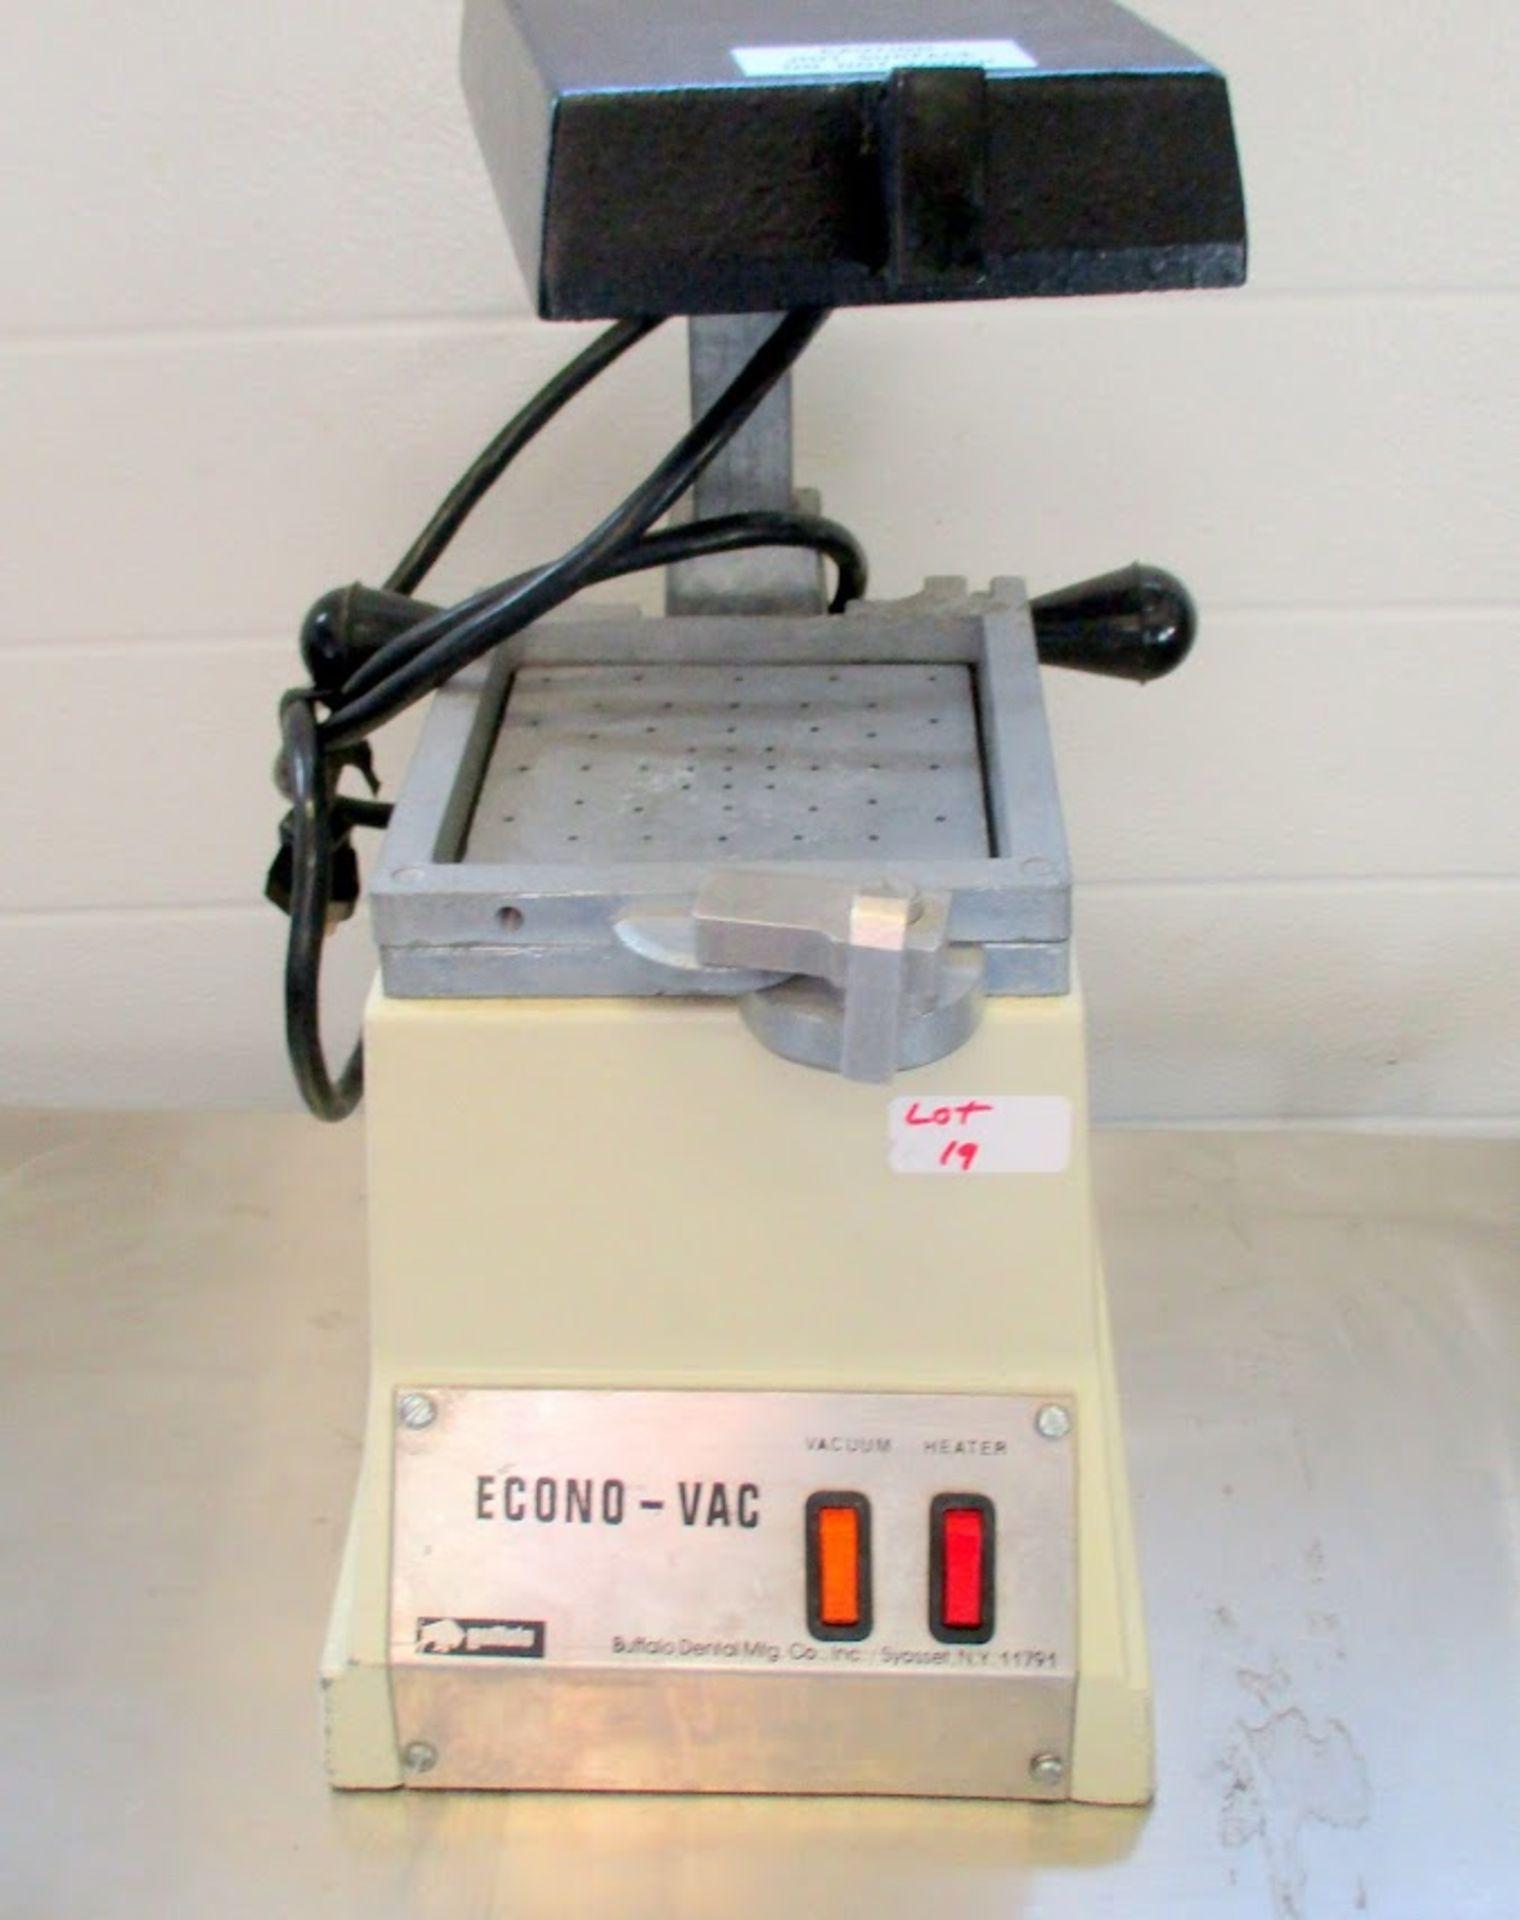 Buffalo Econo-Vac Vacuum former. 115V